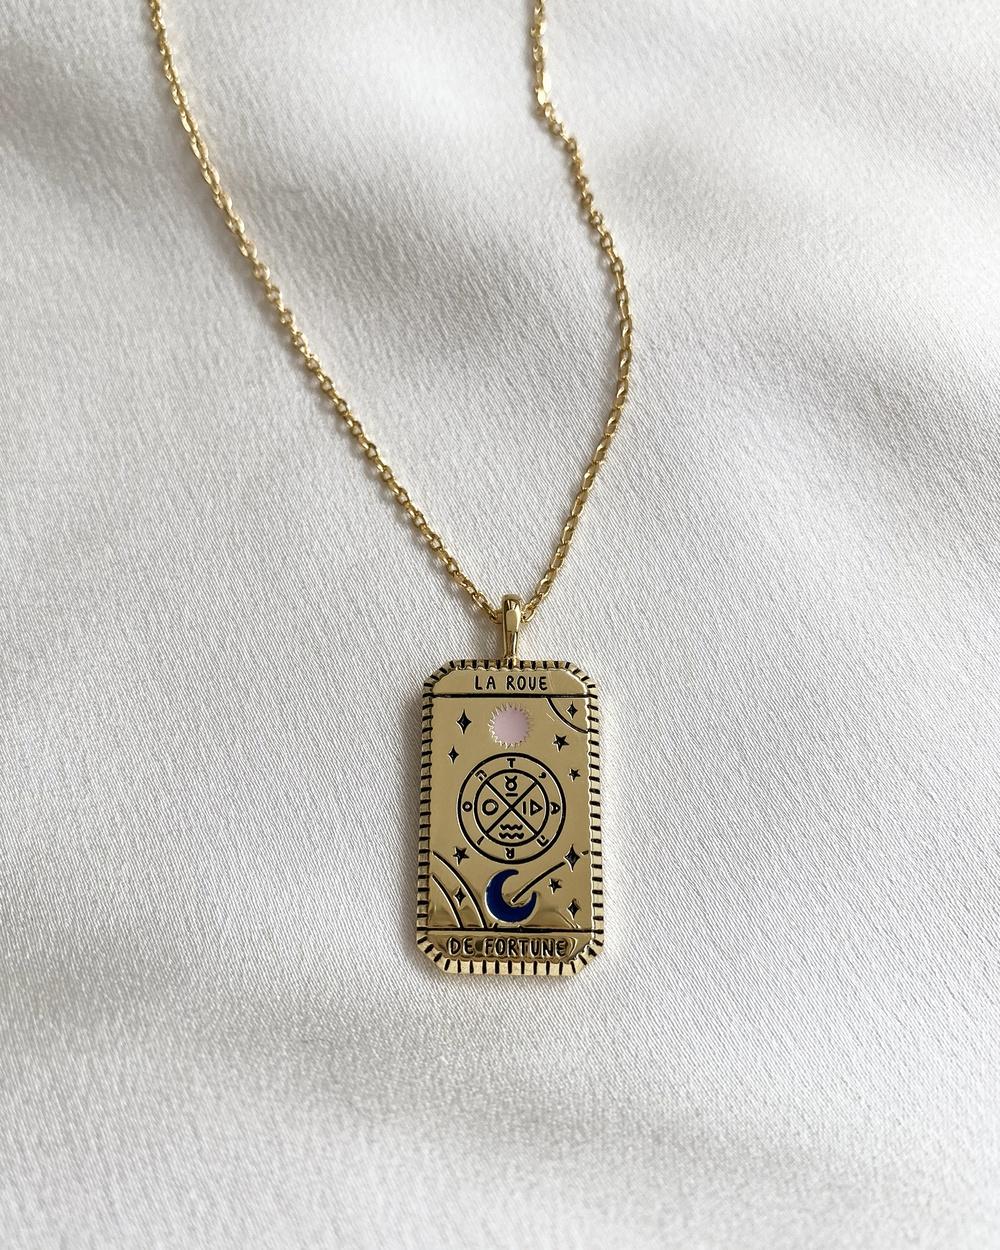 Wanderlust + Co La Roue De Fortune Gold Tarot Necklace Jewellery Gold